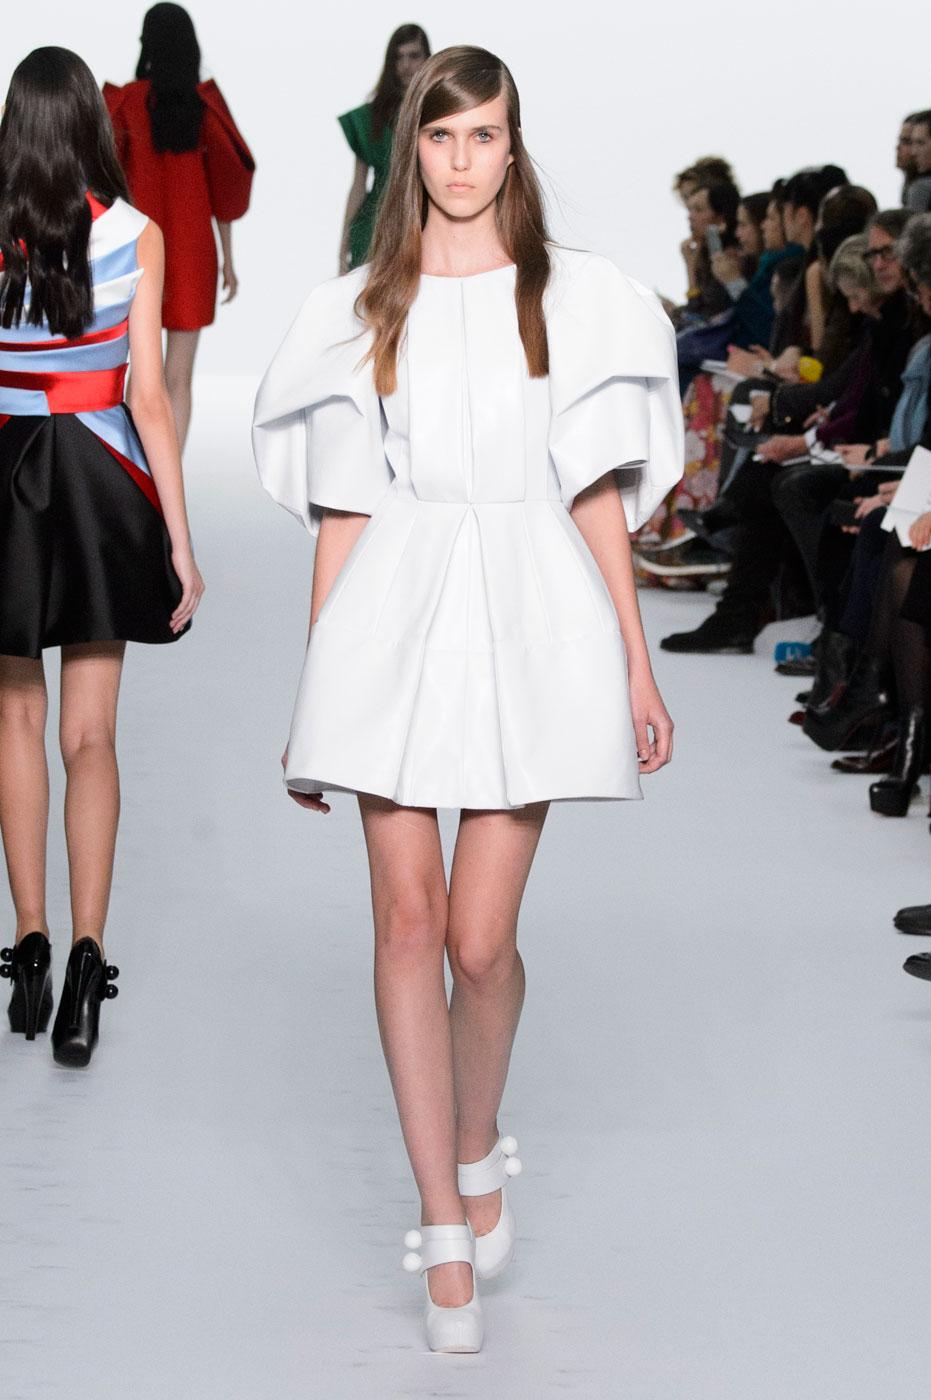 Kayek-fashion-runway-show-haute-couture-paris-spring-summer-2015-the-impression-29